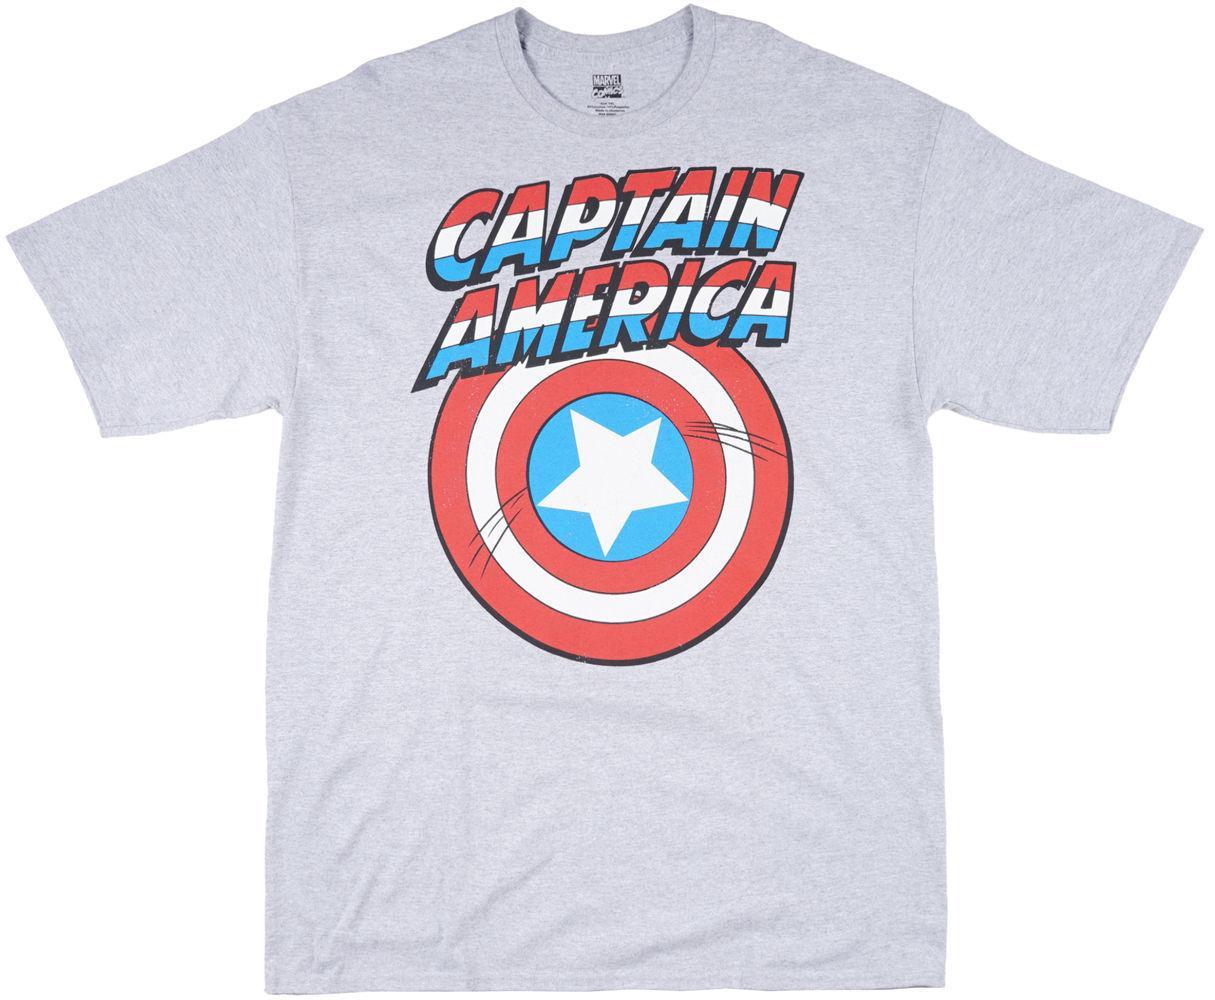 b2ecb919e17 Compre Marvel Avengers Capitán América Logo Shield Camiseta De Hombre BIG  TALL Cool Casual Pride Camiseta Hombre Unisex A $13.91 Del Cls6688521 |  DHgate.Com